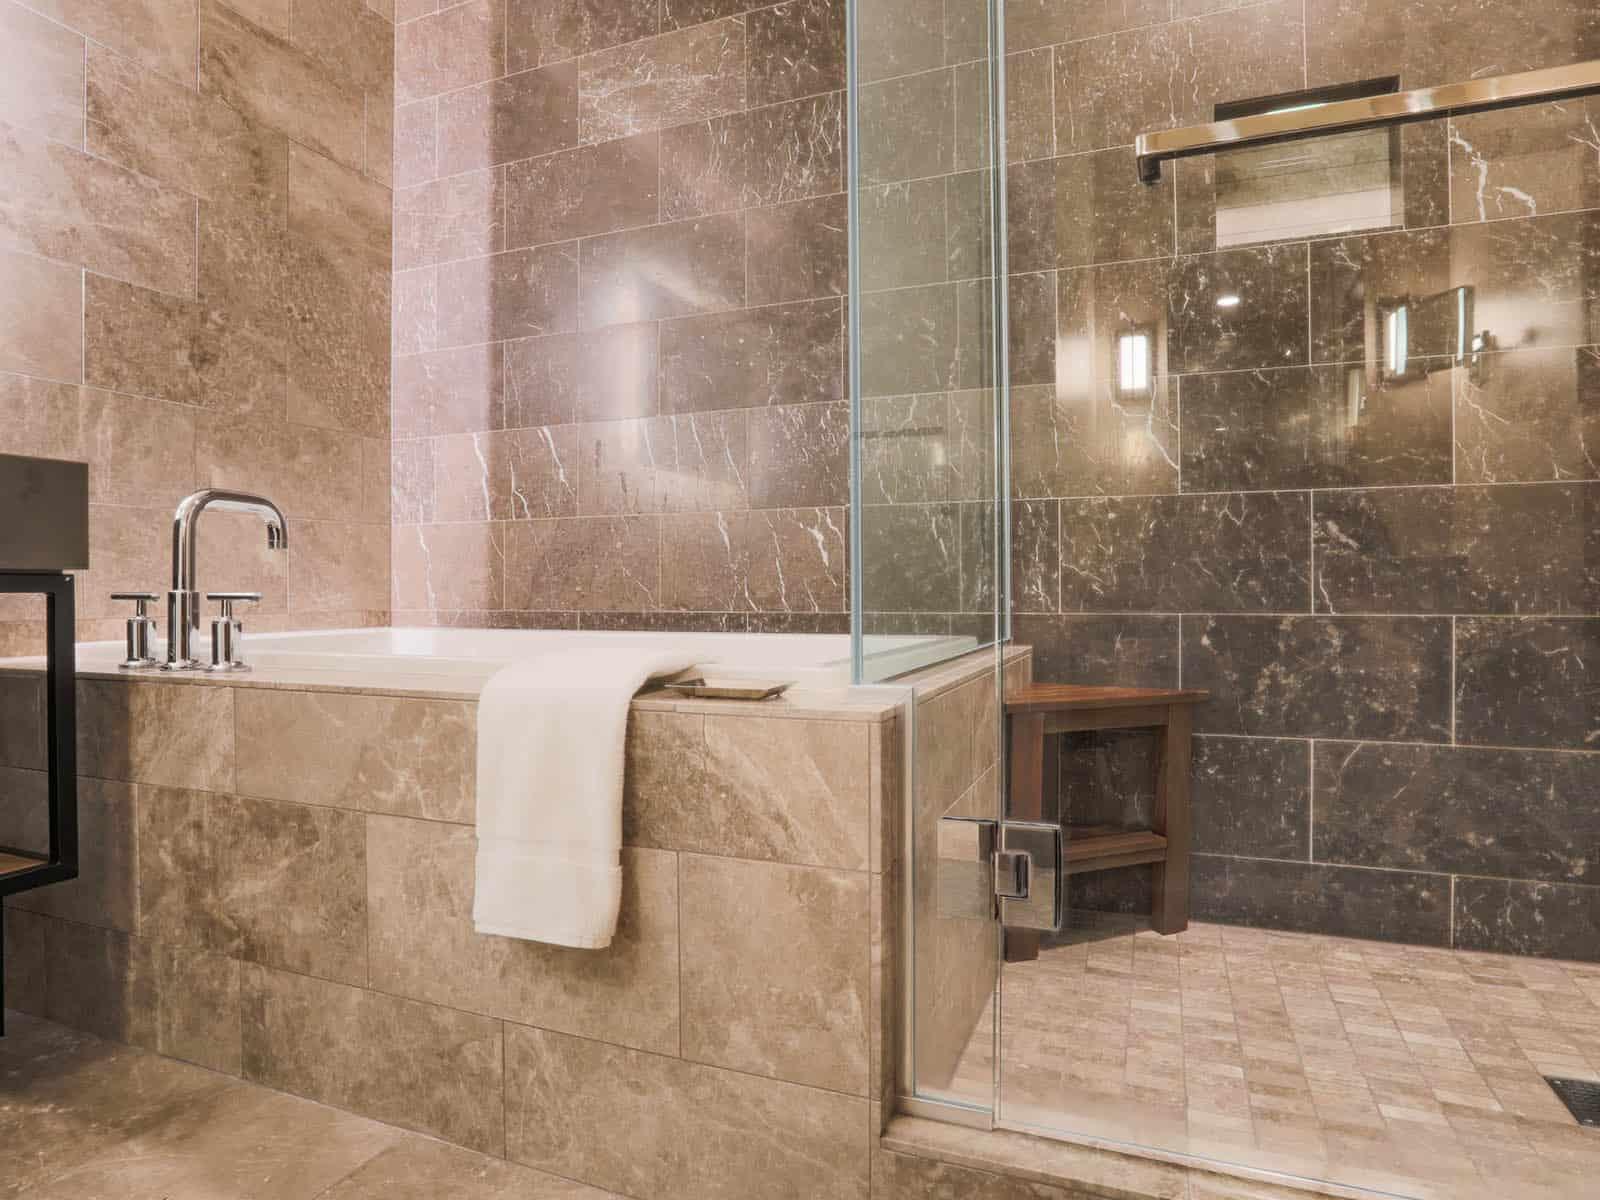 Bathroom Remodeling Contractor Lansing | Master Bath ...